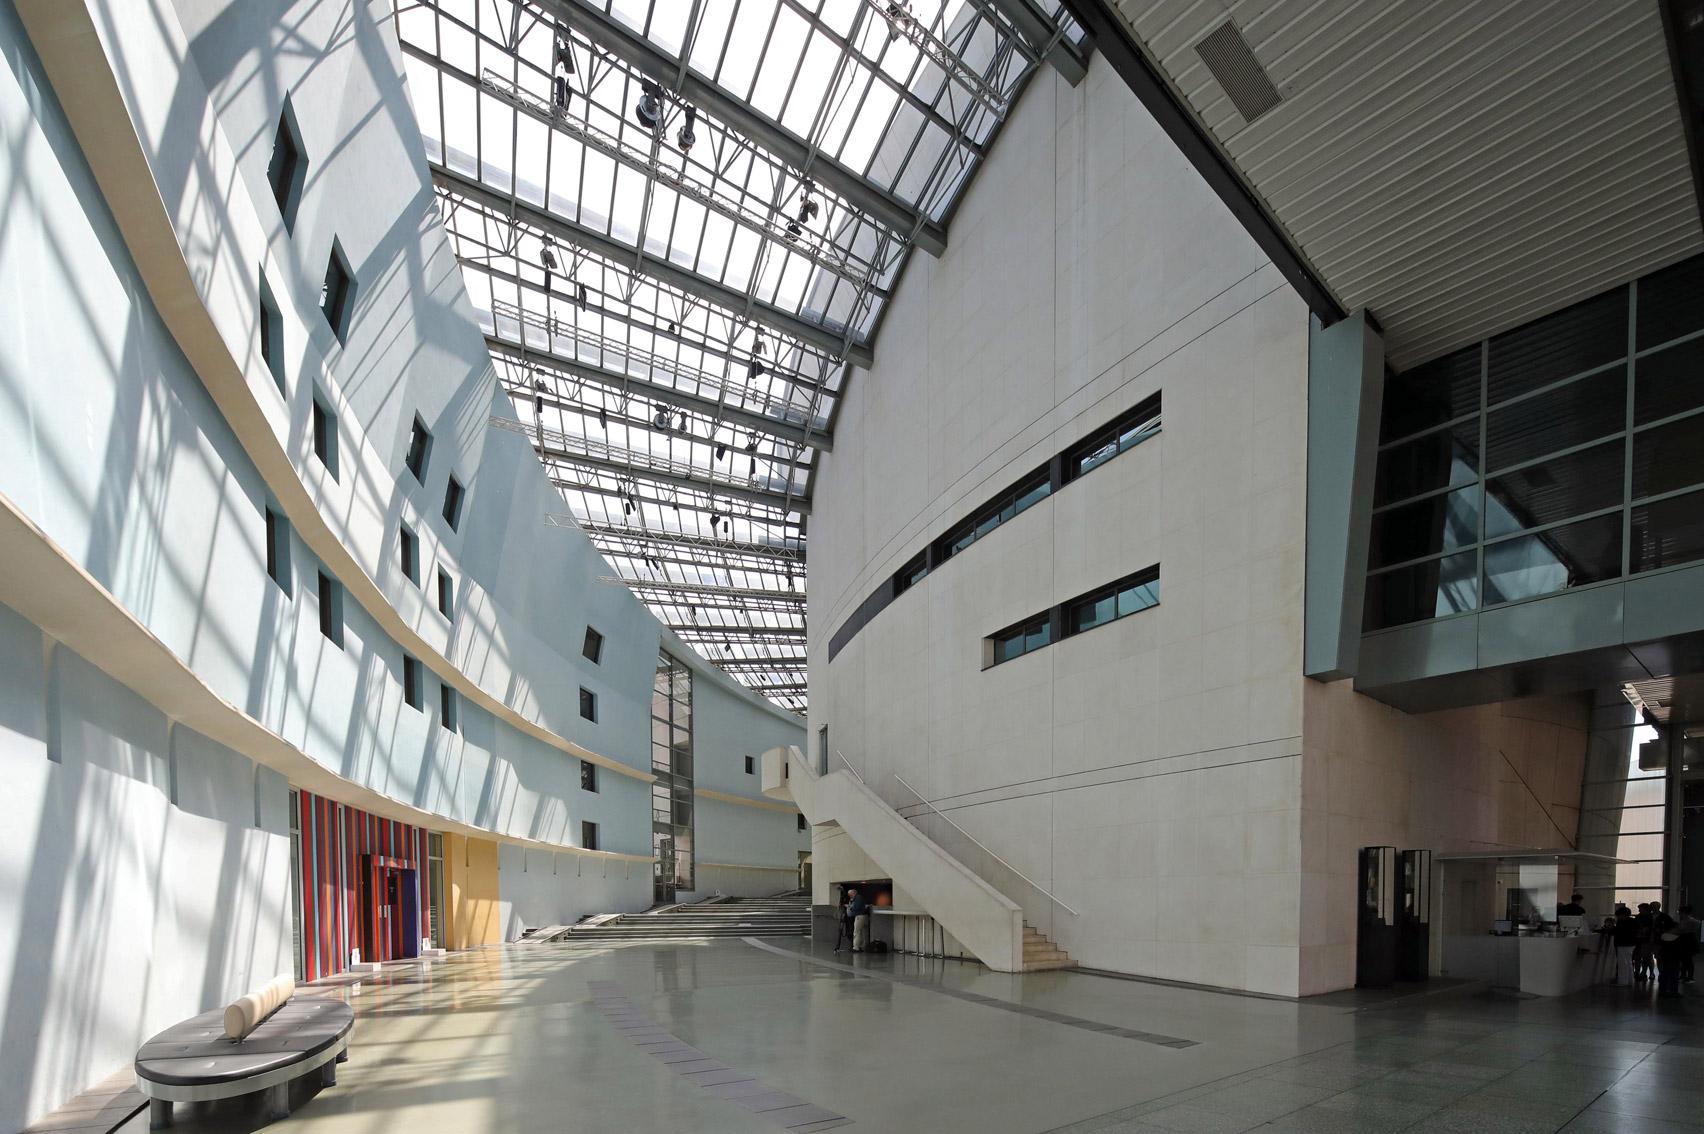 Christian de Portzamparc wins 2018 Praemium Imperiale for architecture